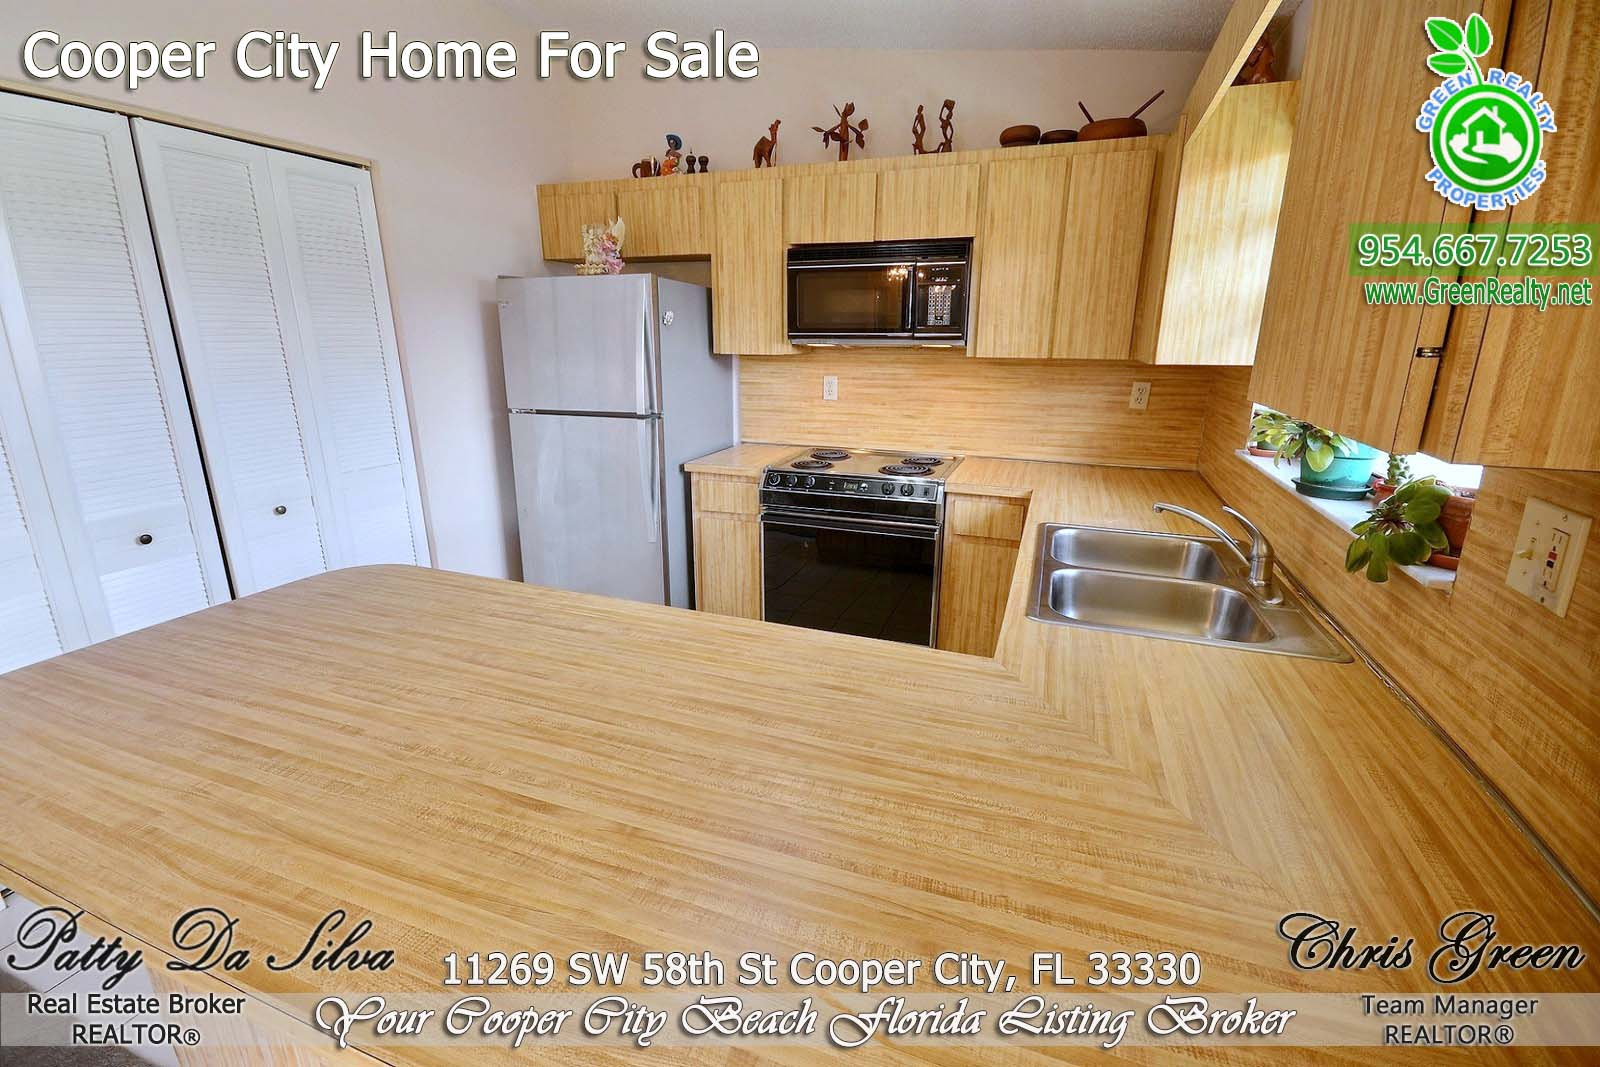 10 Cooper City Real Estate - Villas (17)